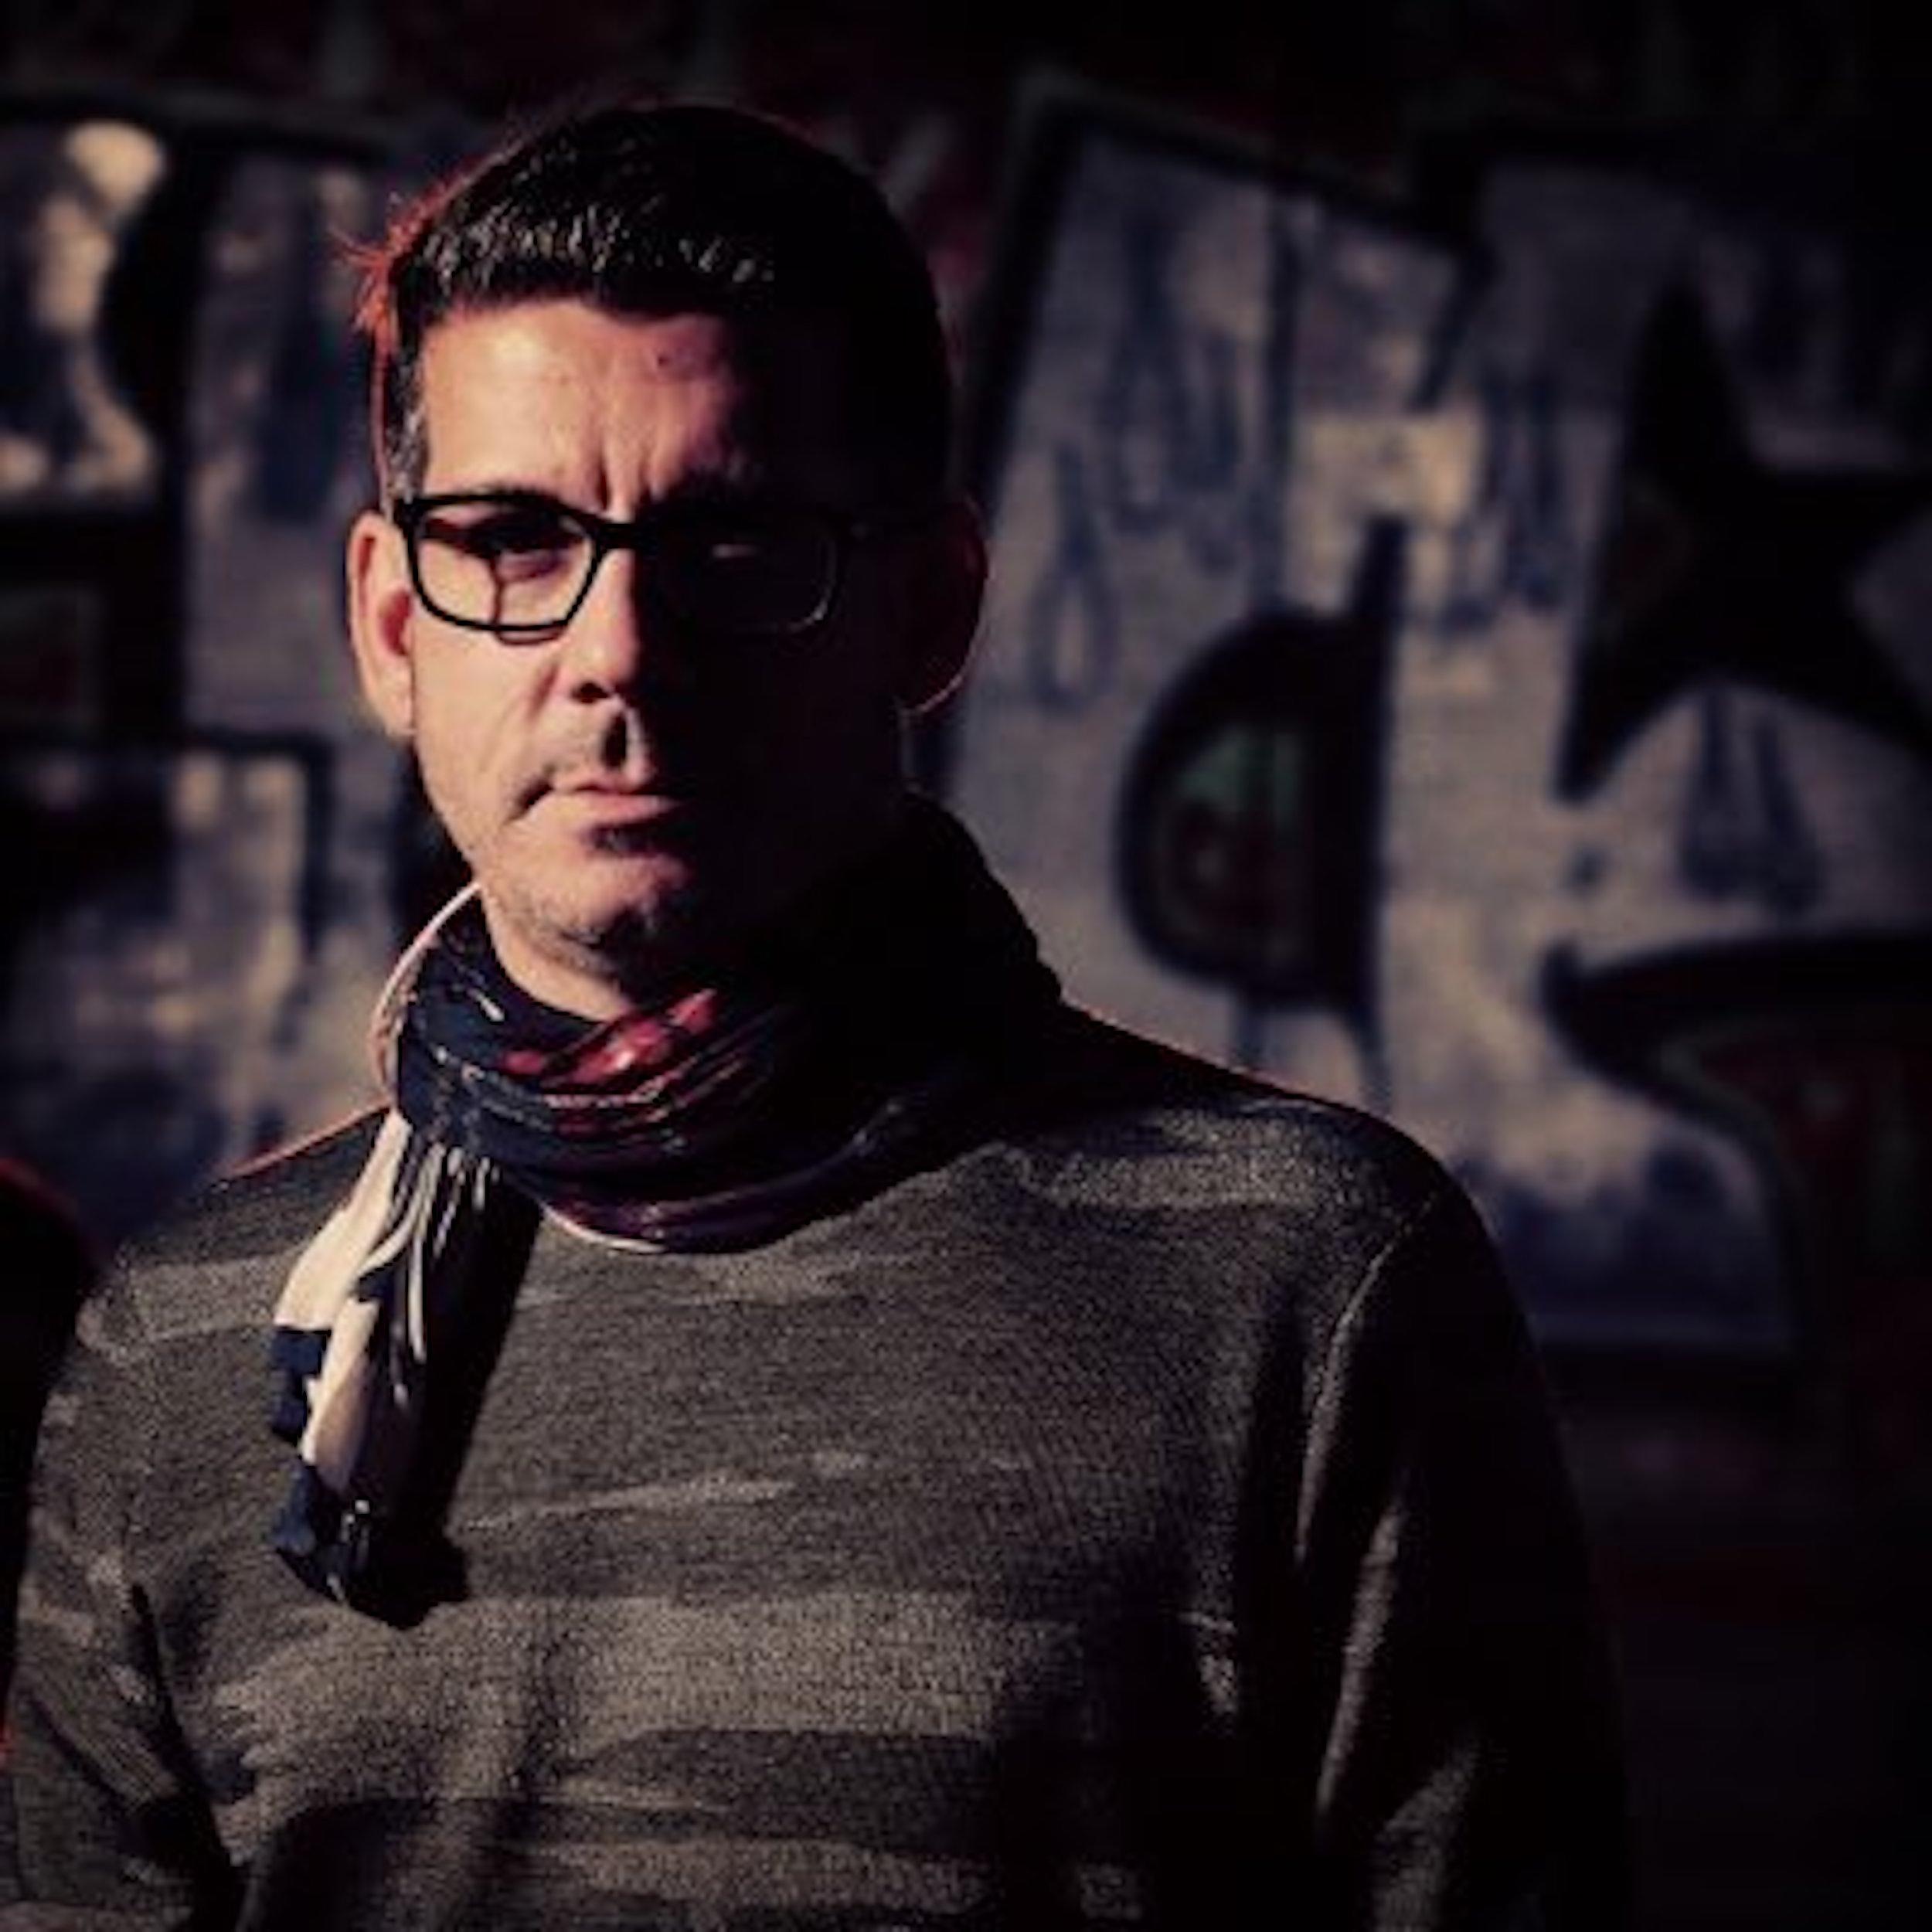 Director David Rousseau